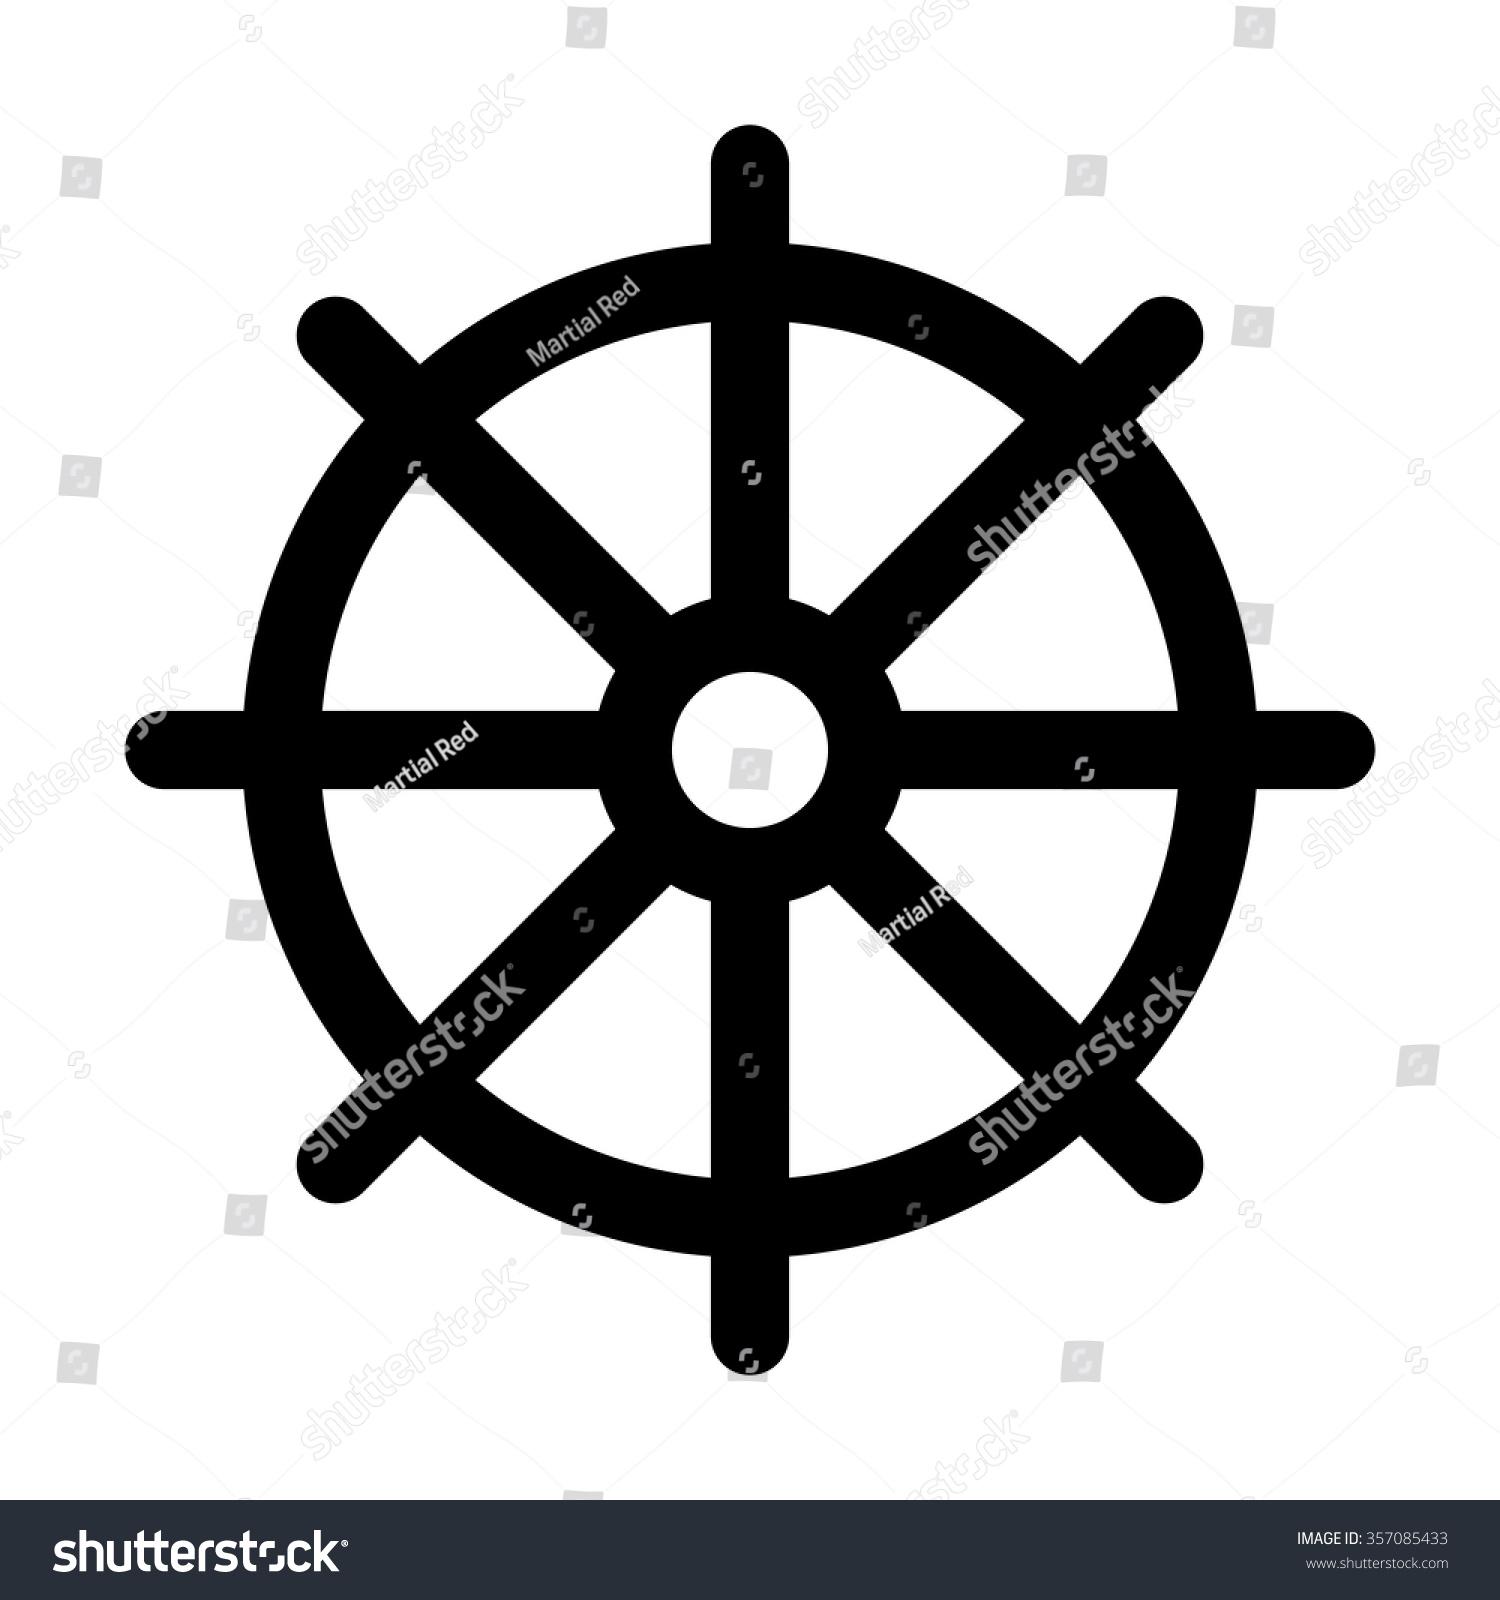 Dharmachakra Wheel Dharma Symbol Buddhism Hinduism Stock Vector